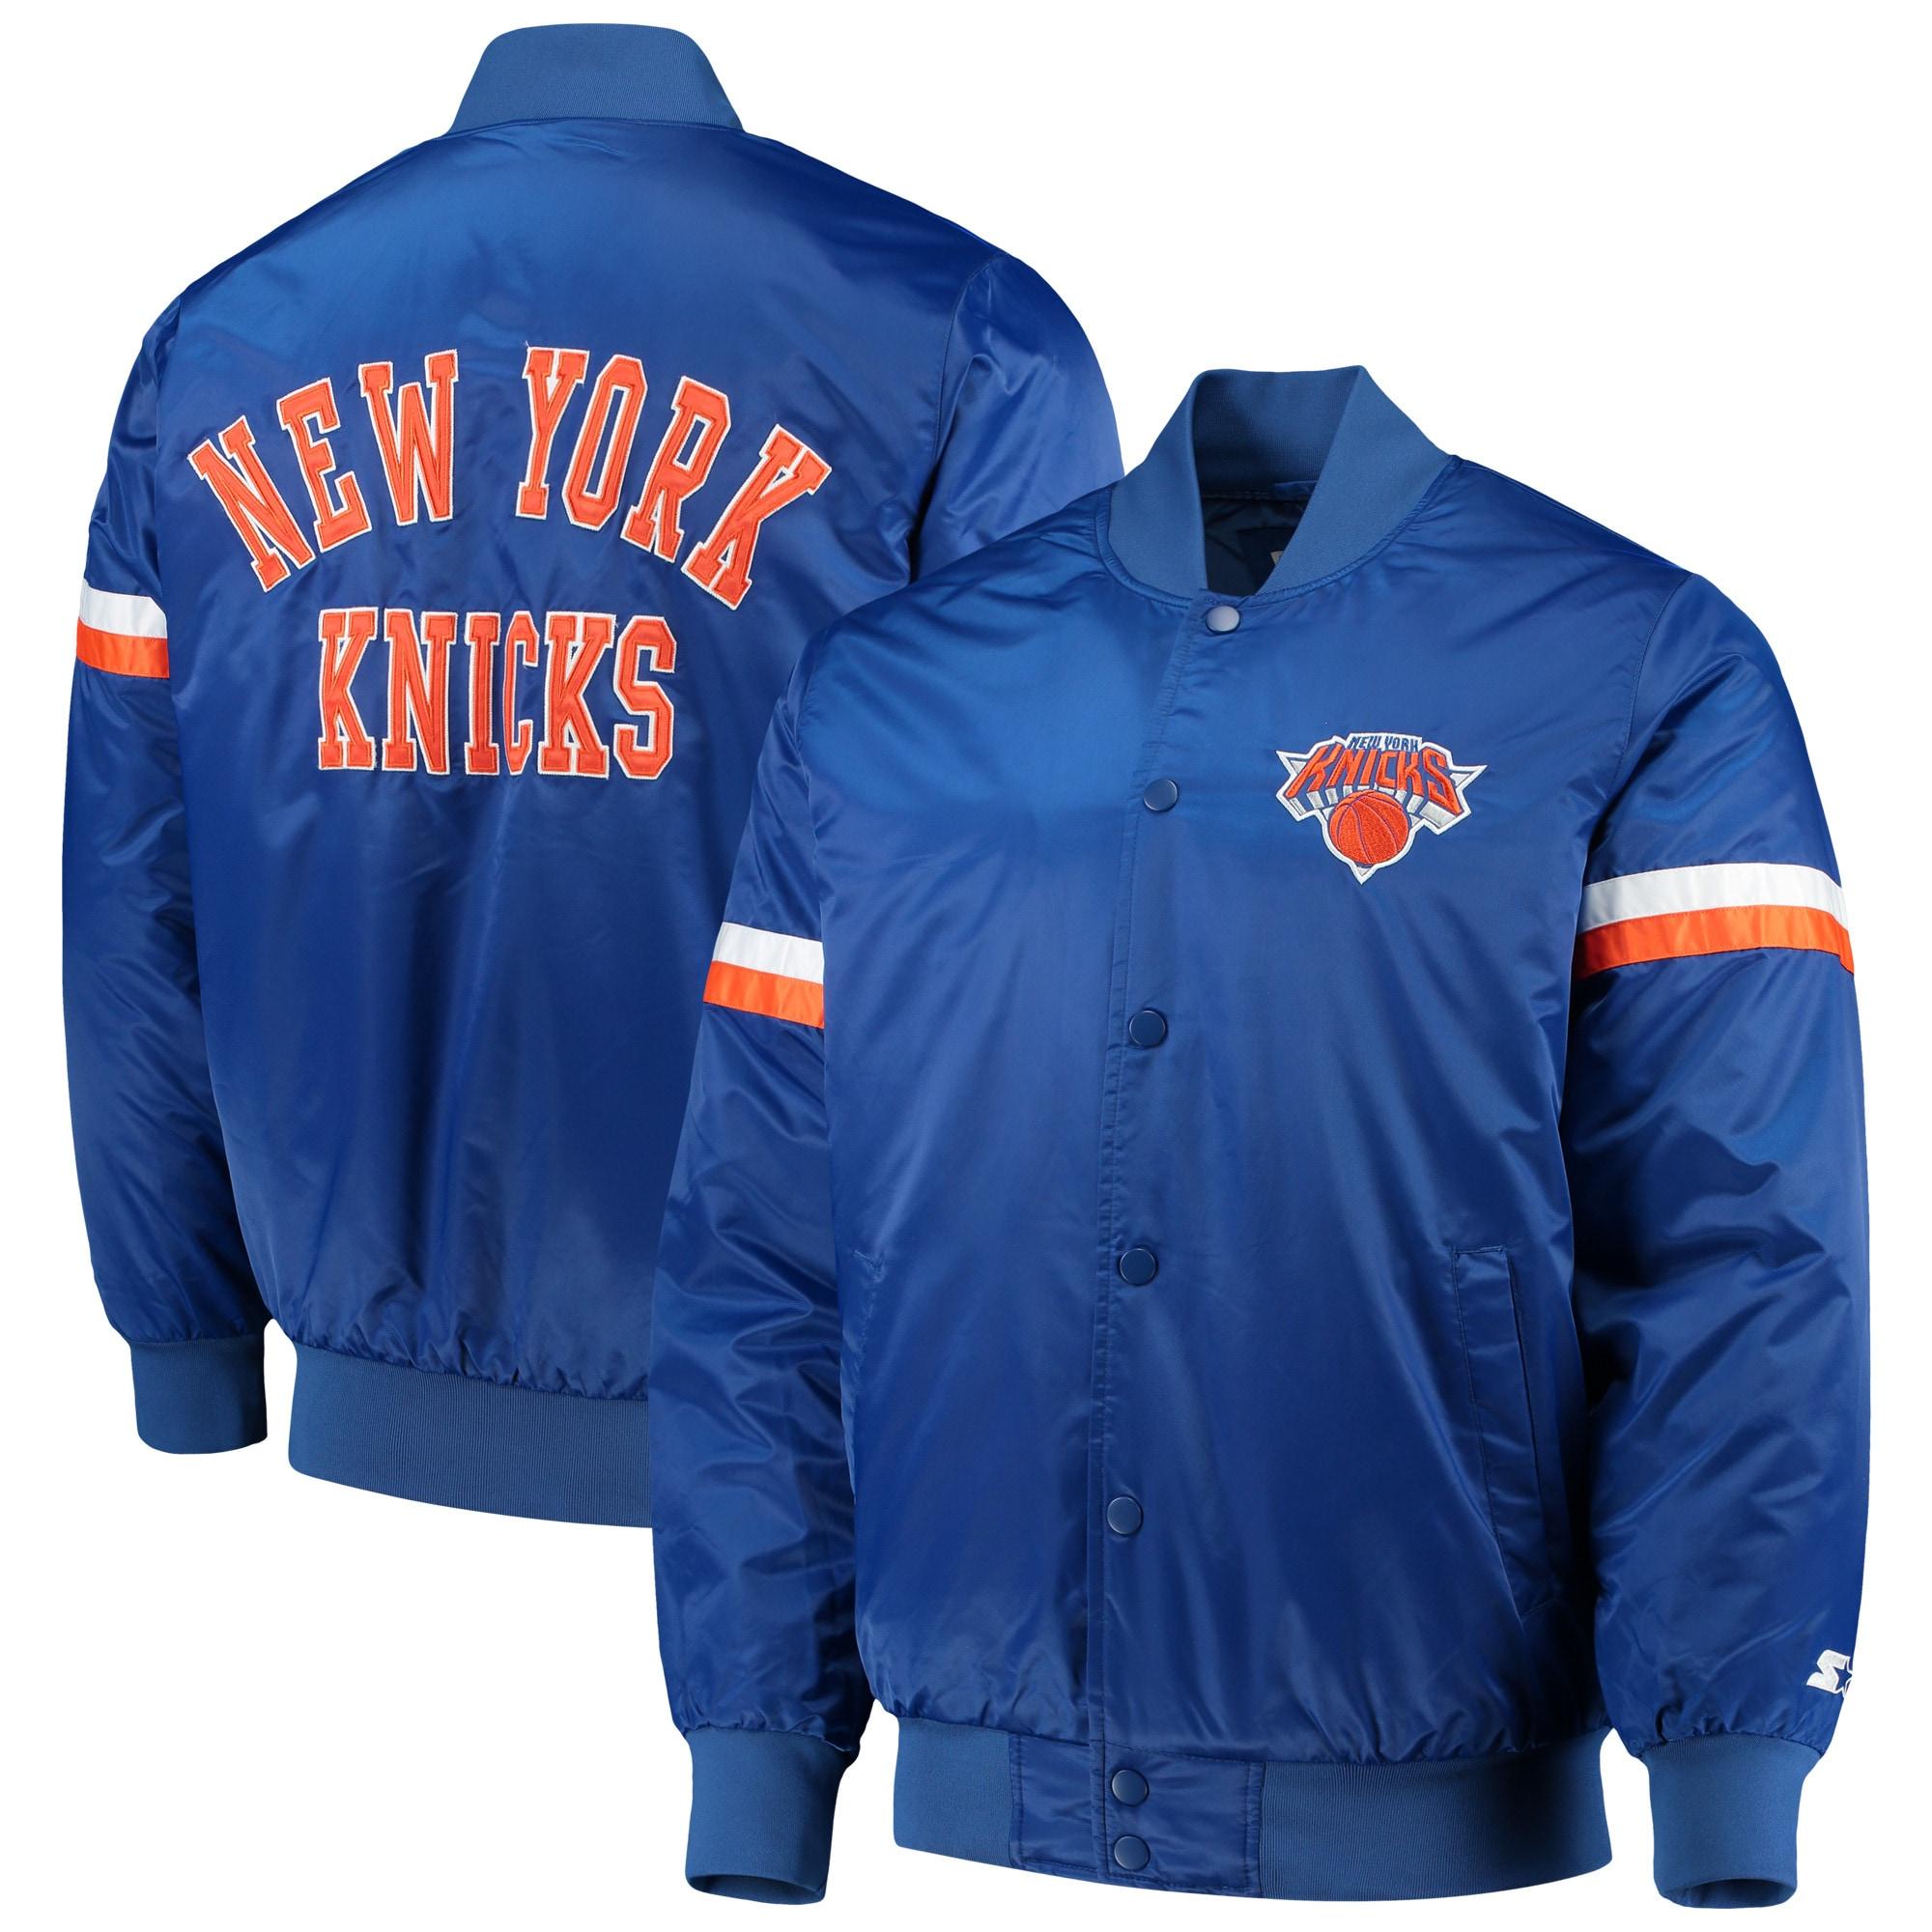 New York Knicks Starter The Champ Varsity Satin Jacket - Blue